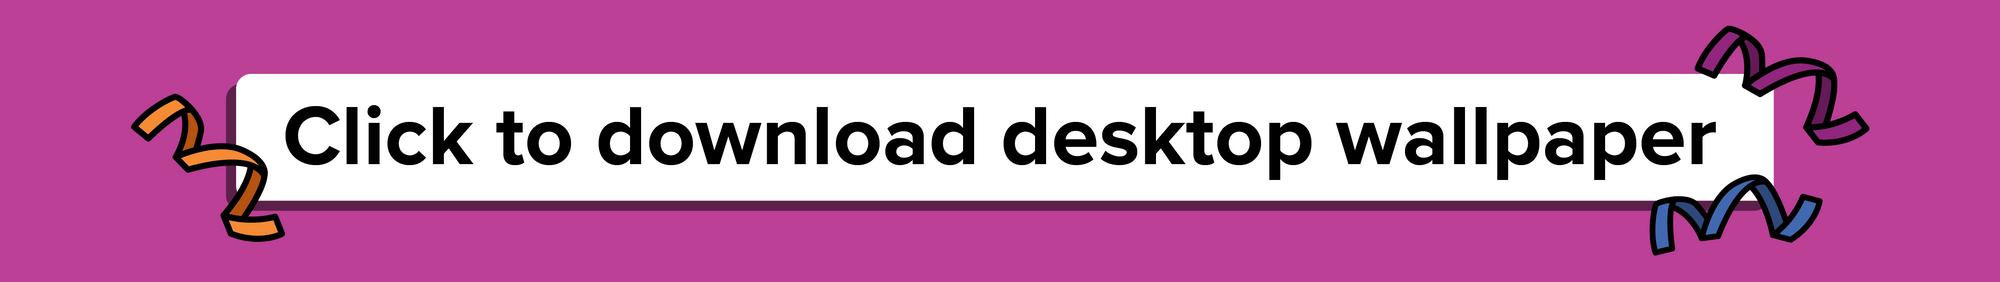 Yak-wallpaper_Desktop-download-04--1--2